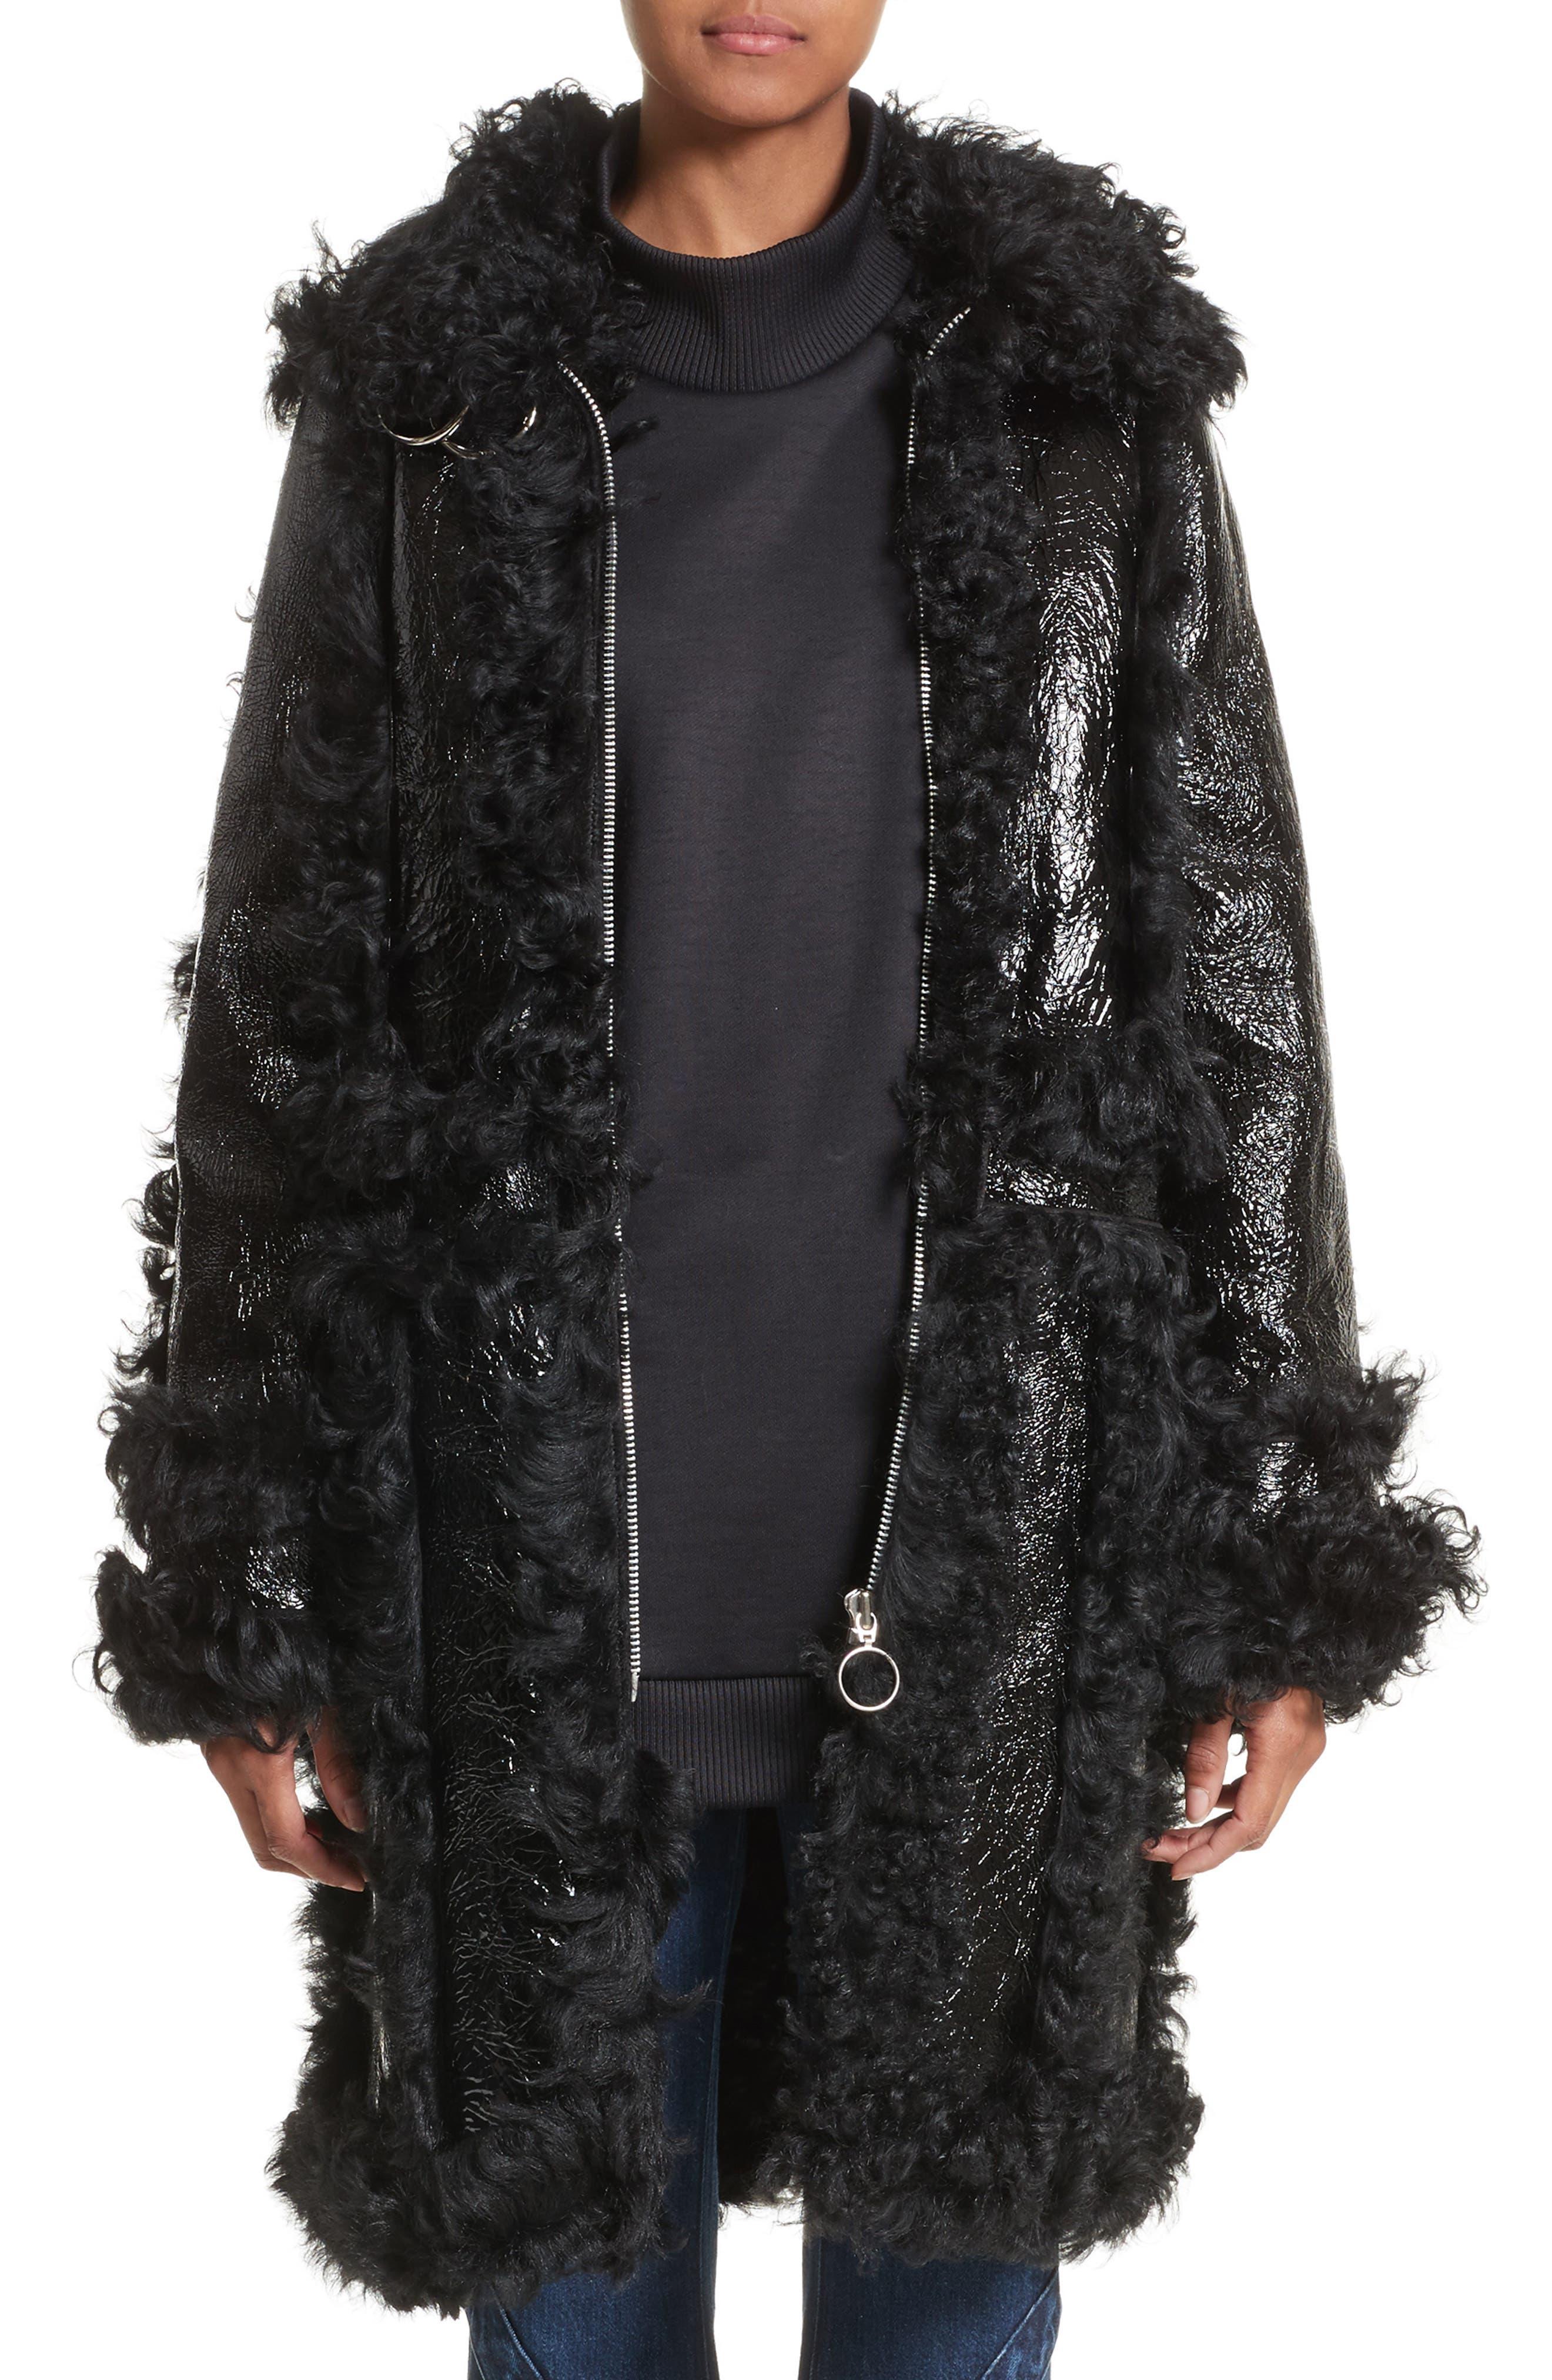 Marques'Almeida Foiled Genuine Shearling Coat,                             Main thumbnail 1, color,                             Black/Black